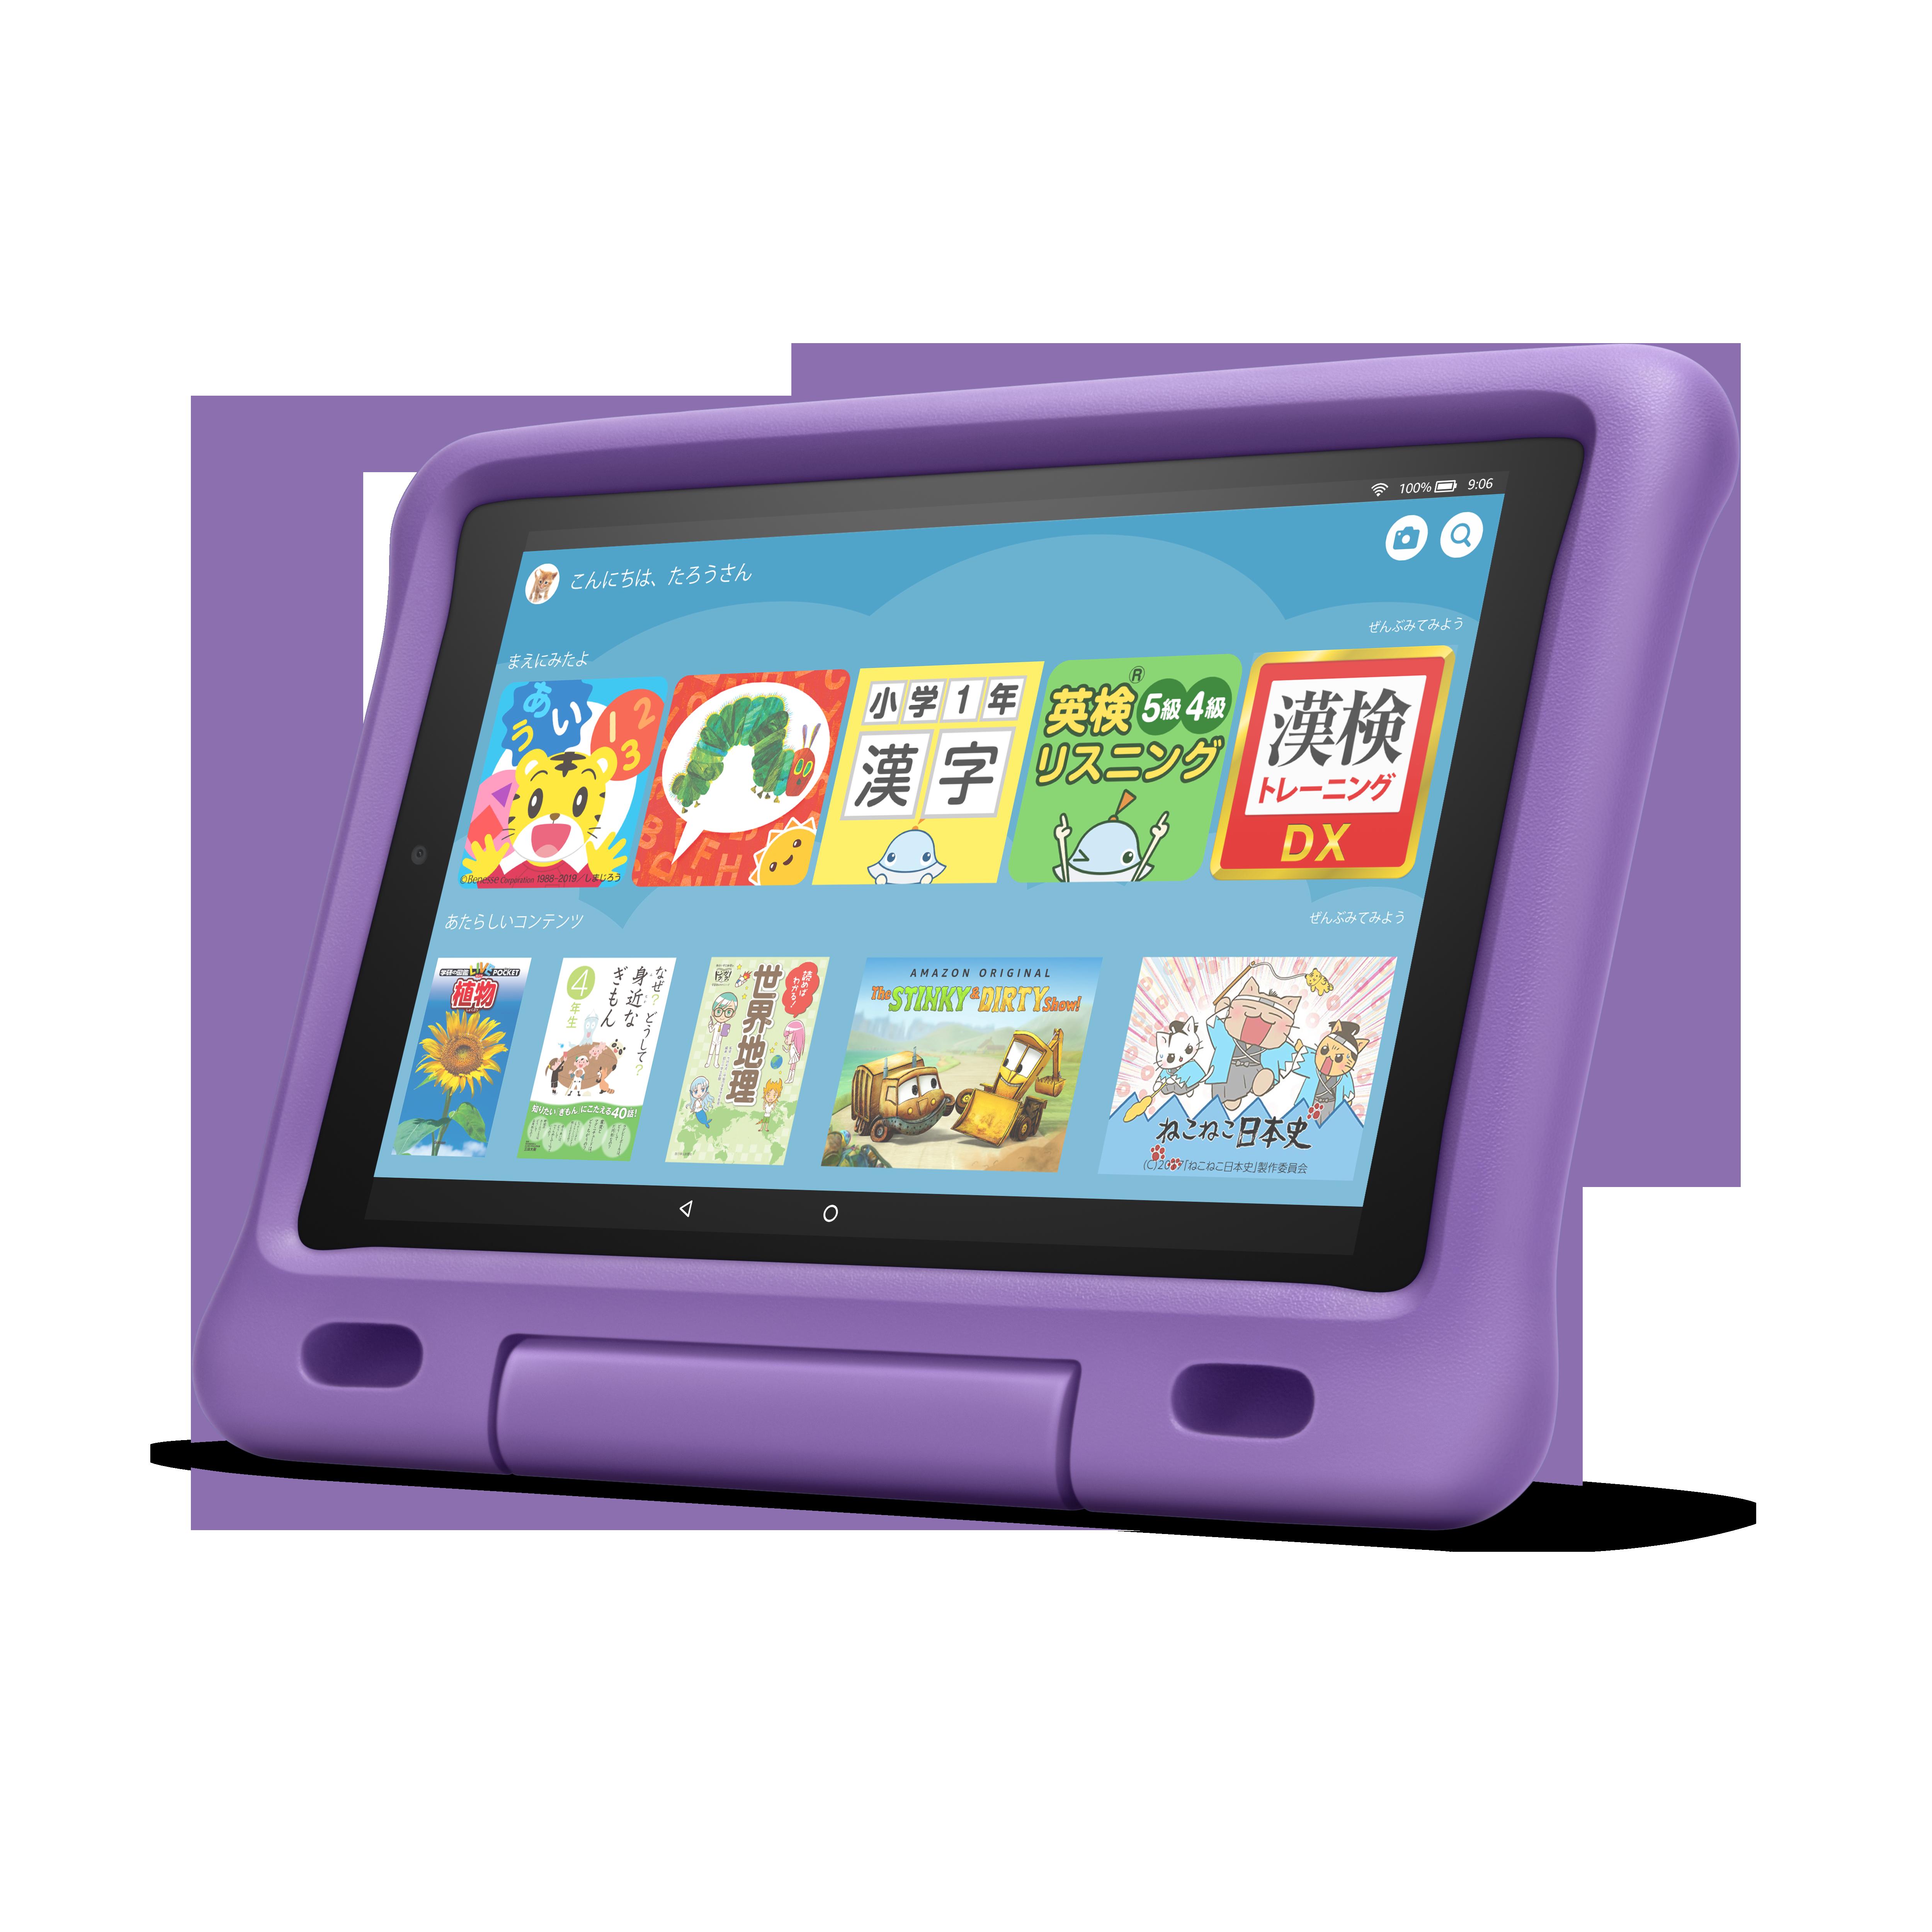 Amazon Newsroom Amazon Kindleキッズモデル と Fire Hd 10タブレット キッズモデル を発売